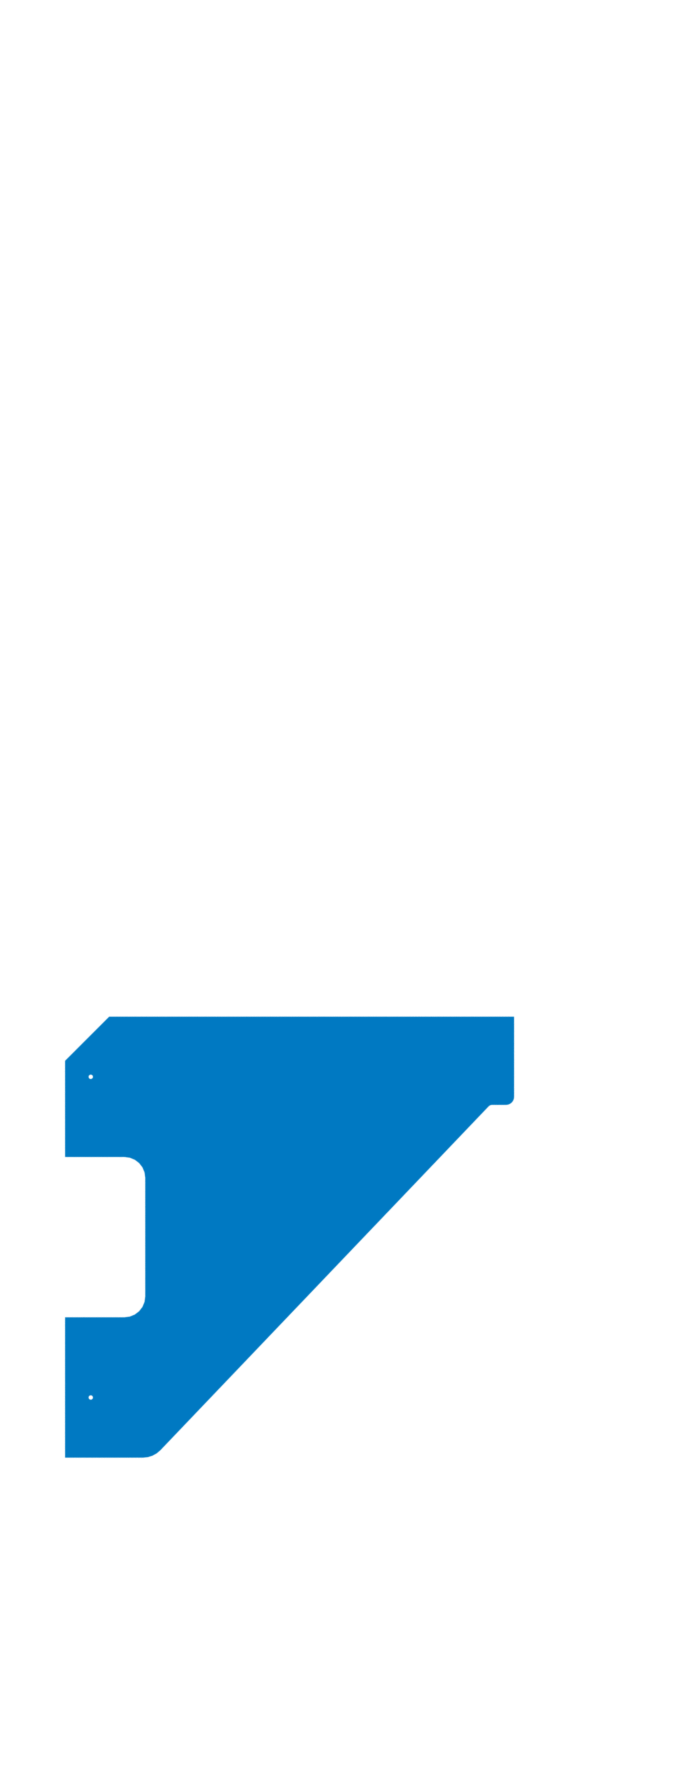 CONE2 - vue profil